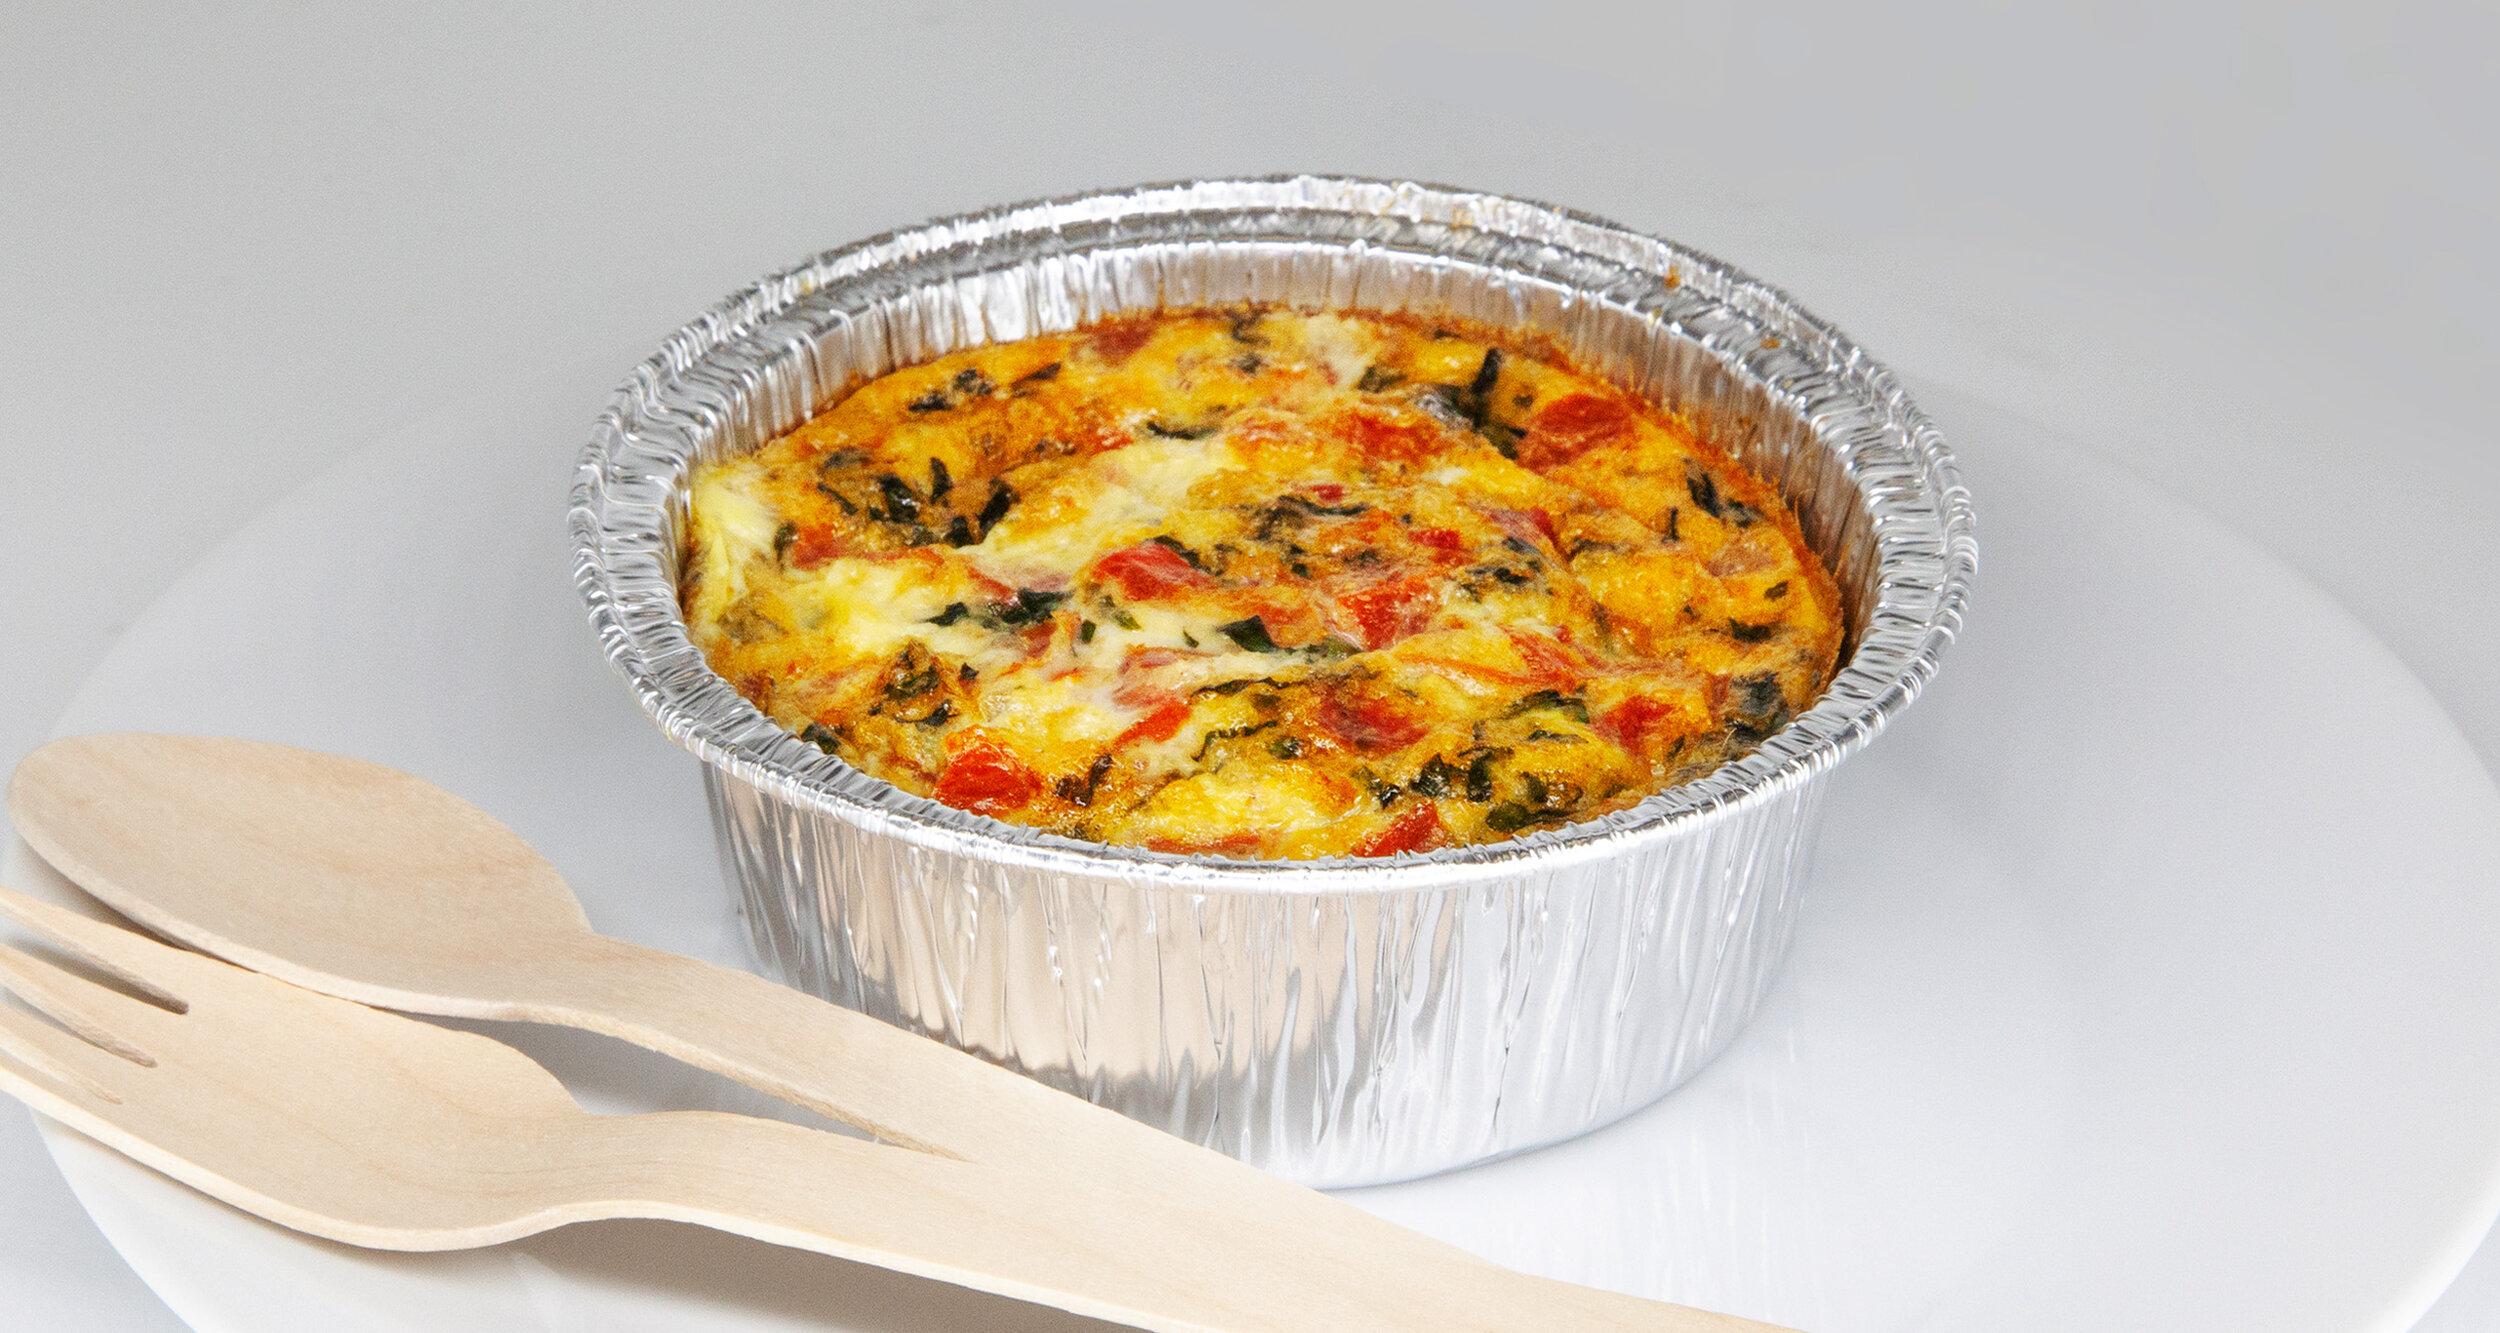 GOAT CHEESE EGG MUFFIN - 196.2 KCAL PER SERVINGEgg, arugula, tomato, goat cheese, salt, pepper$23